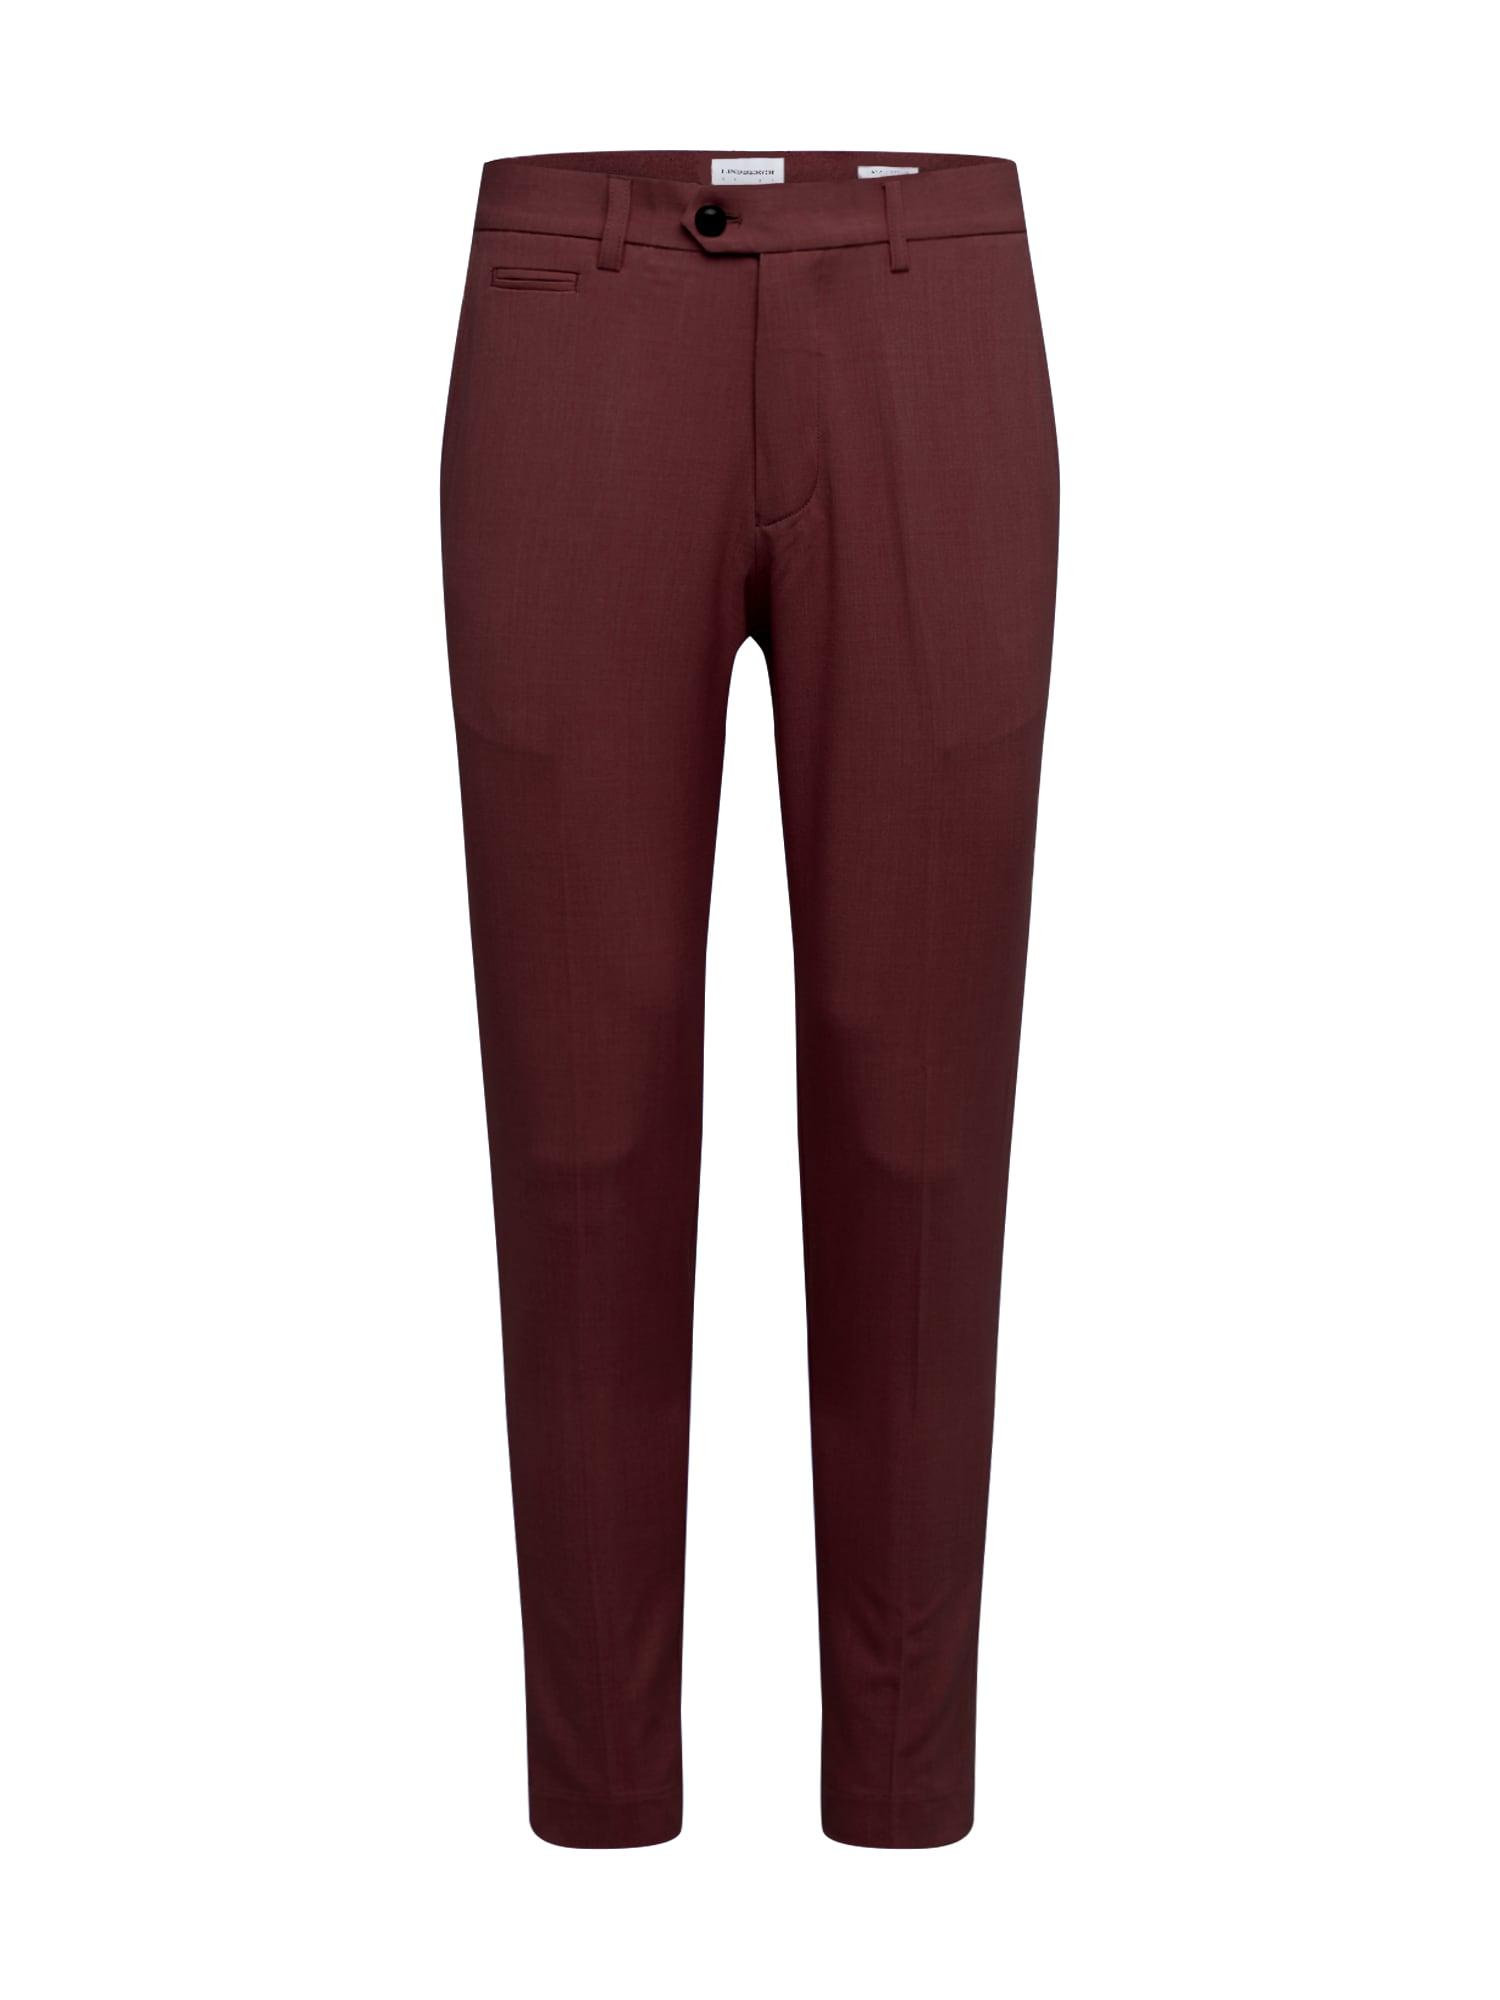 Lindbergh Nohavice s pukmi 'Club pants'  vínovo červená